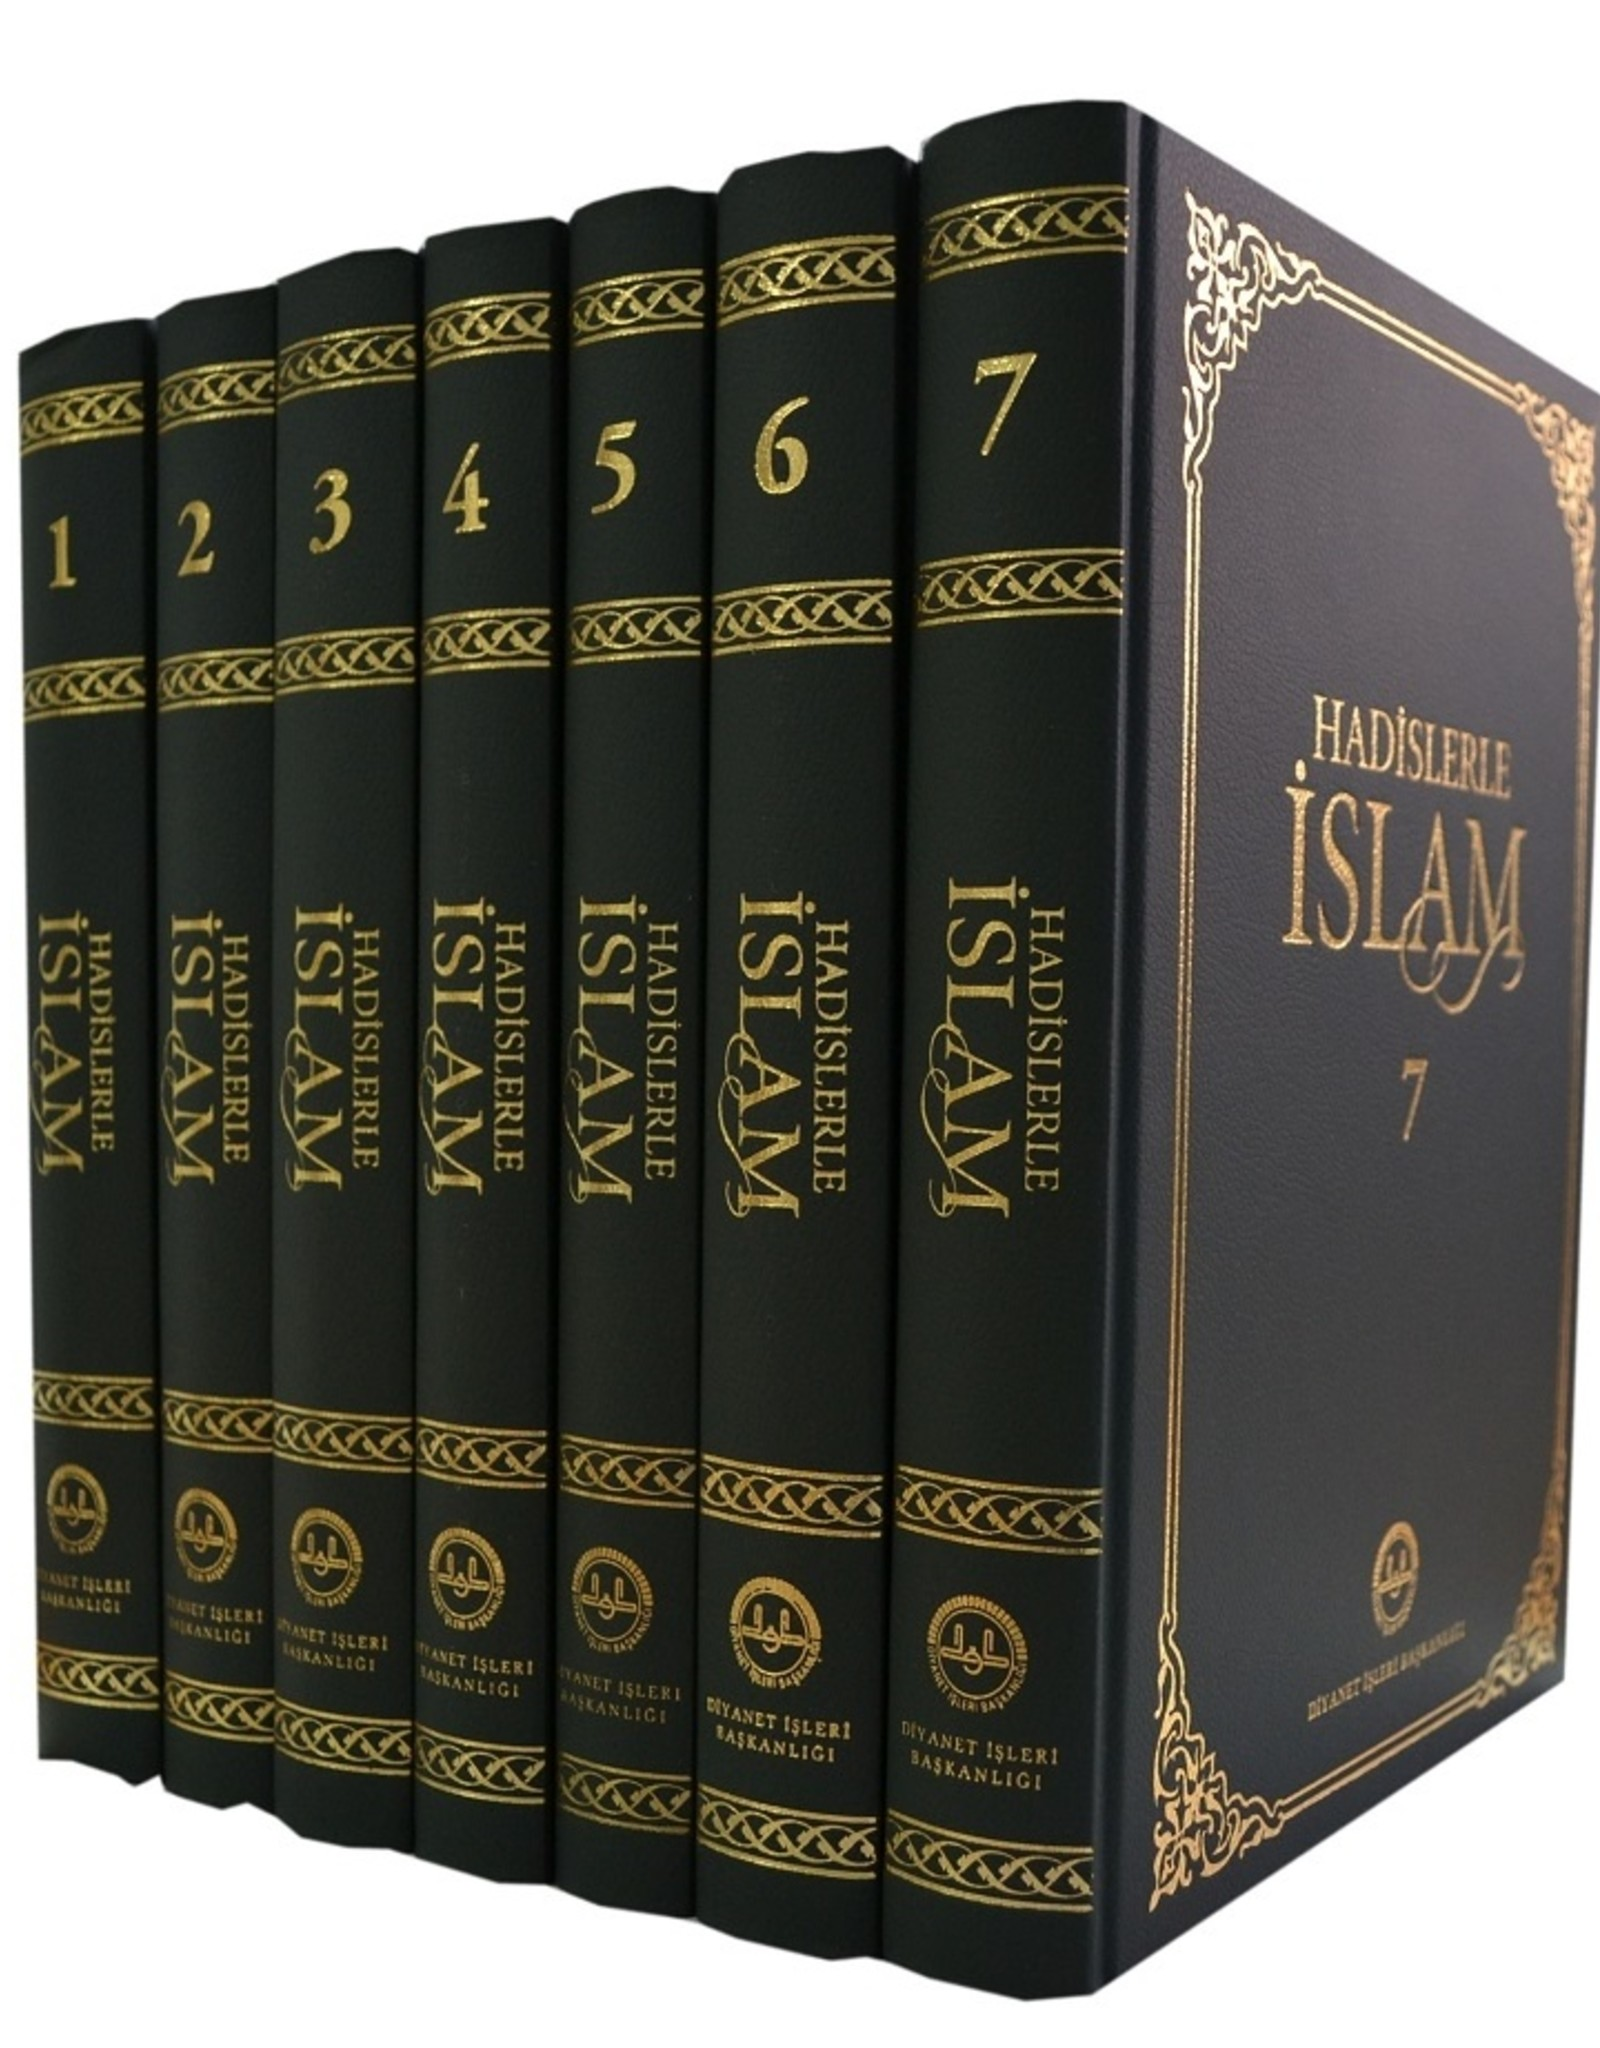 Hadislerle İslam Orta Boy (7 Cilt)